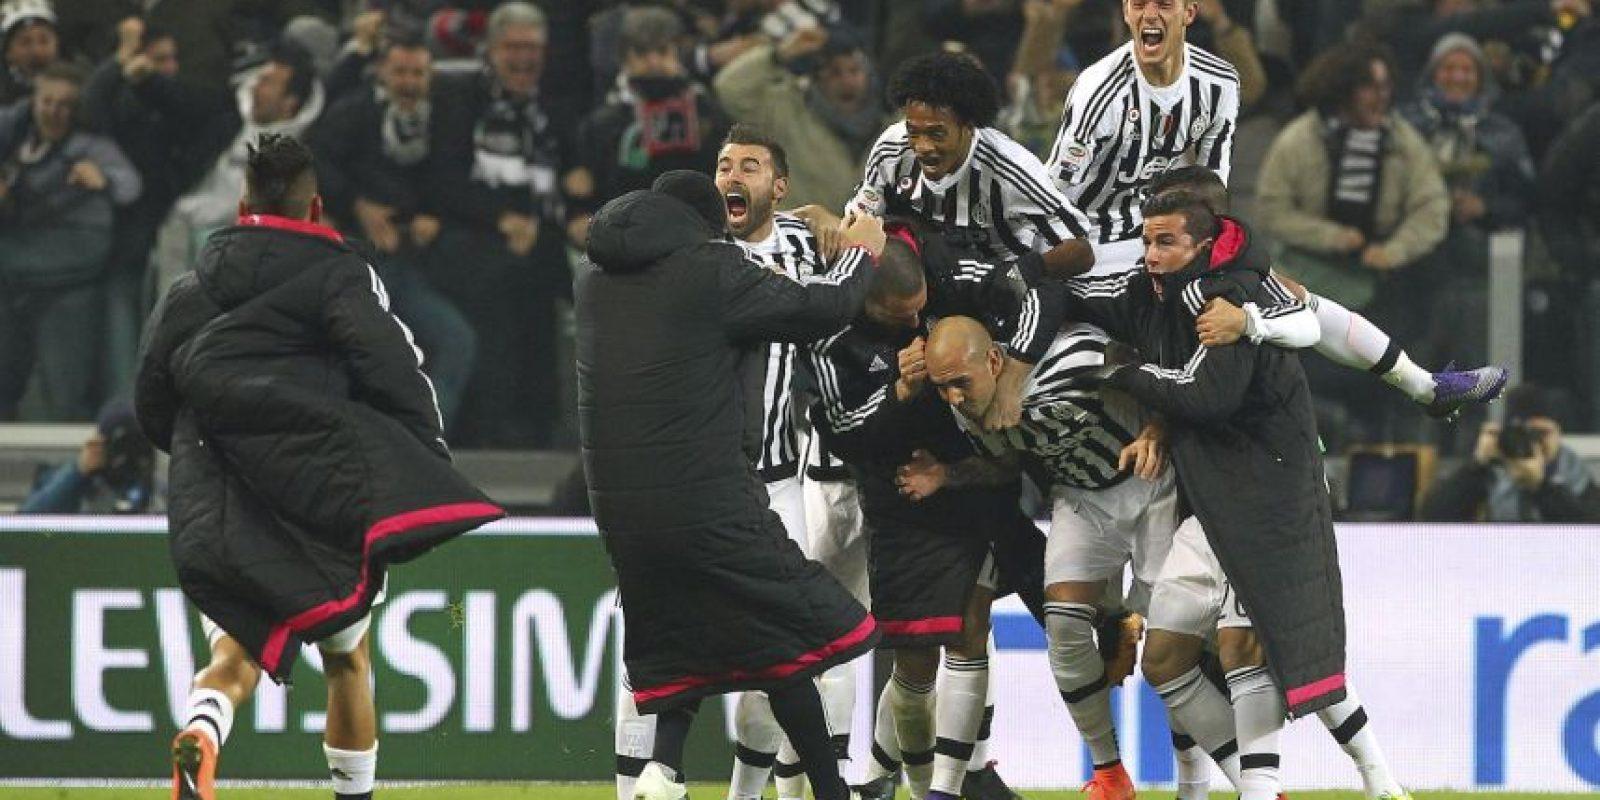 """Juve"" espera sacar ventaja en el duelo de ida Foto:Getty Images"